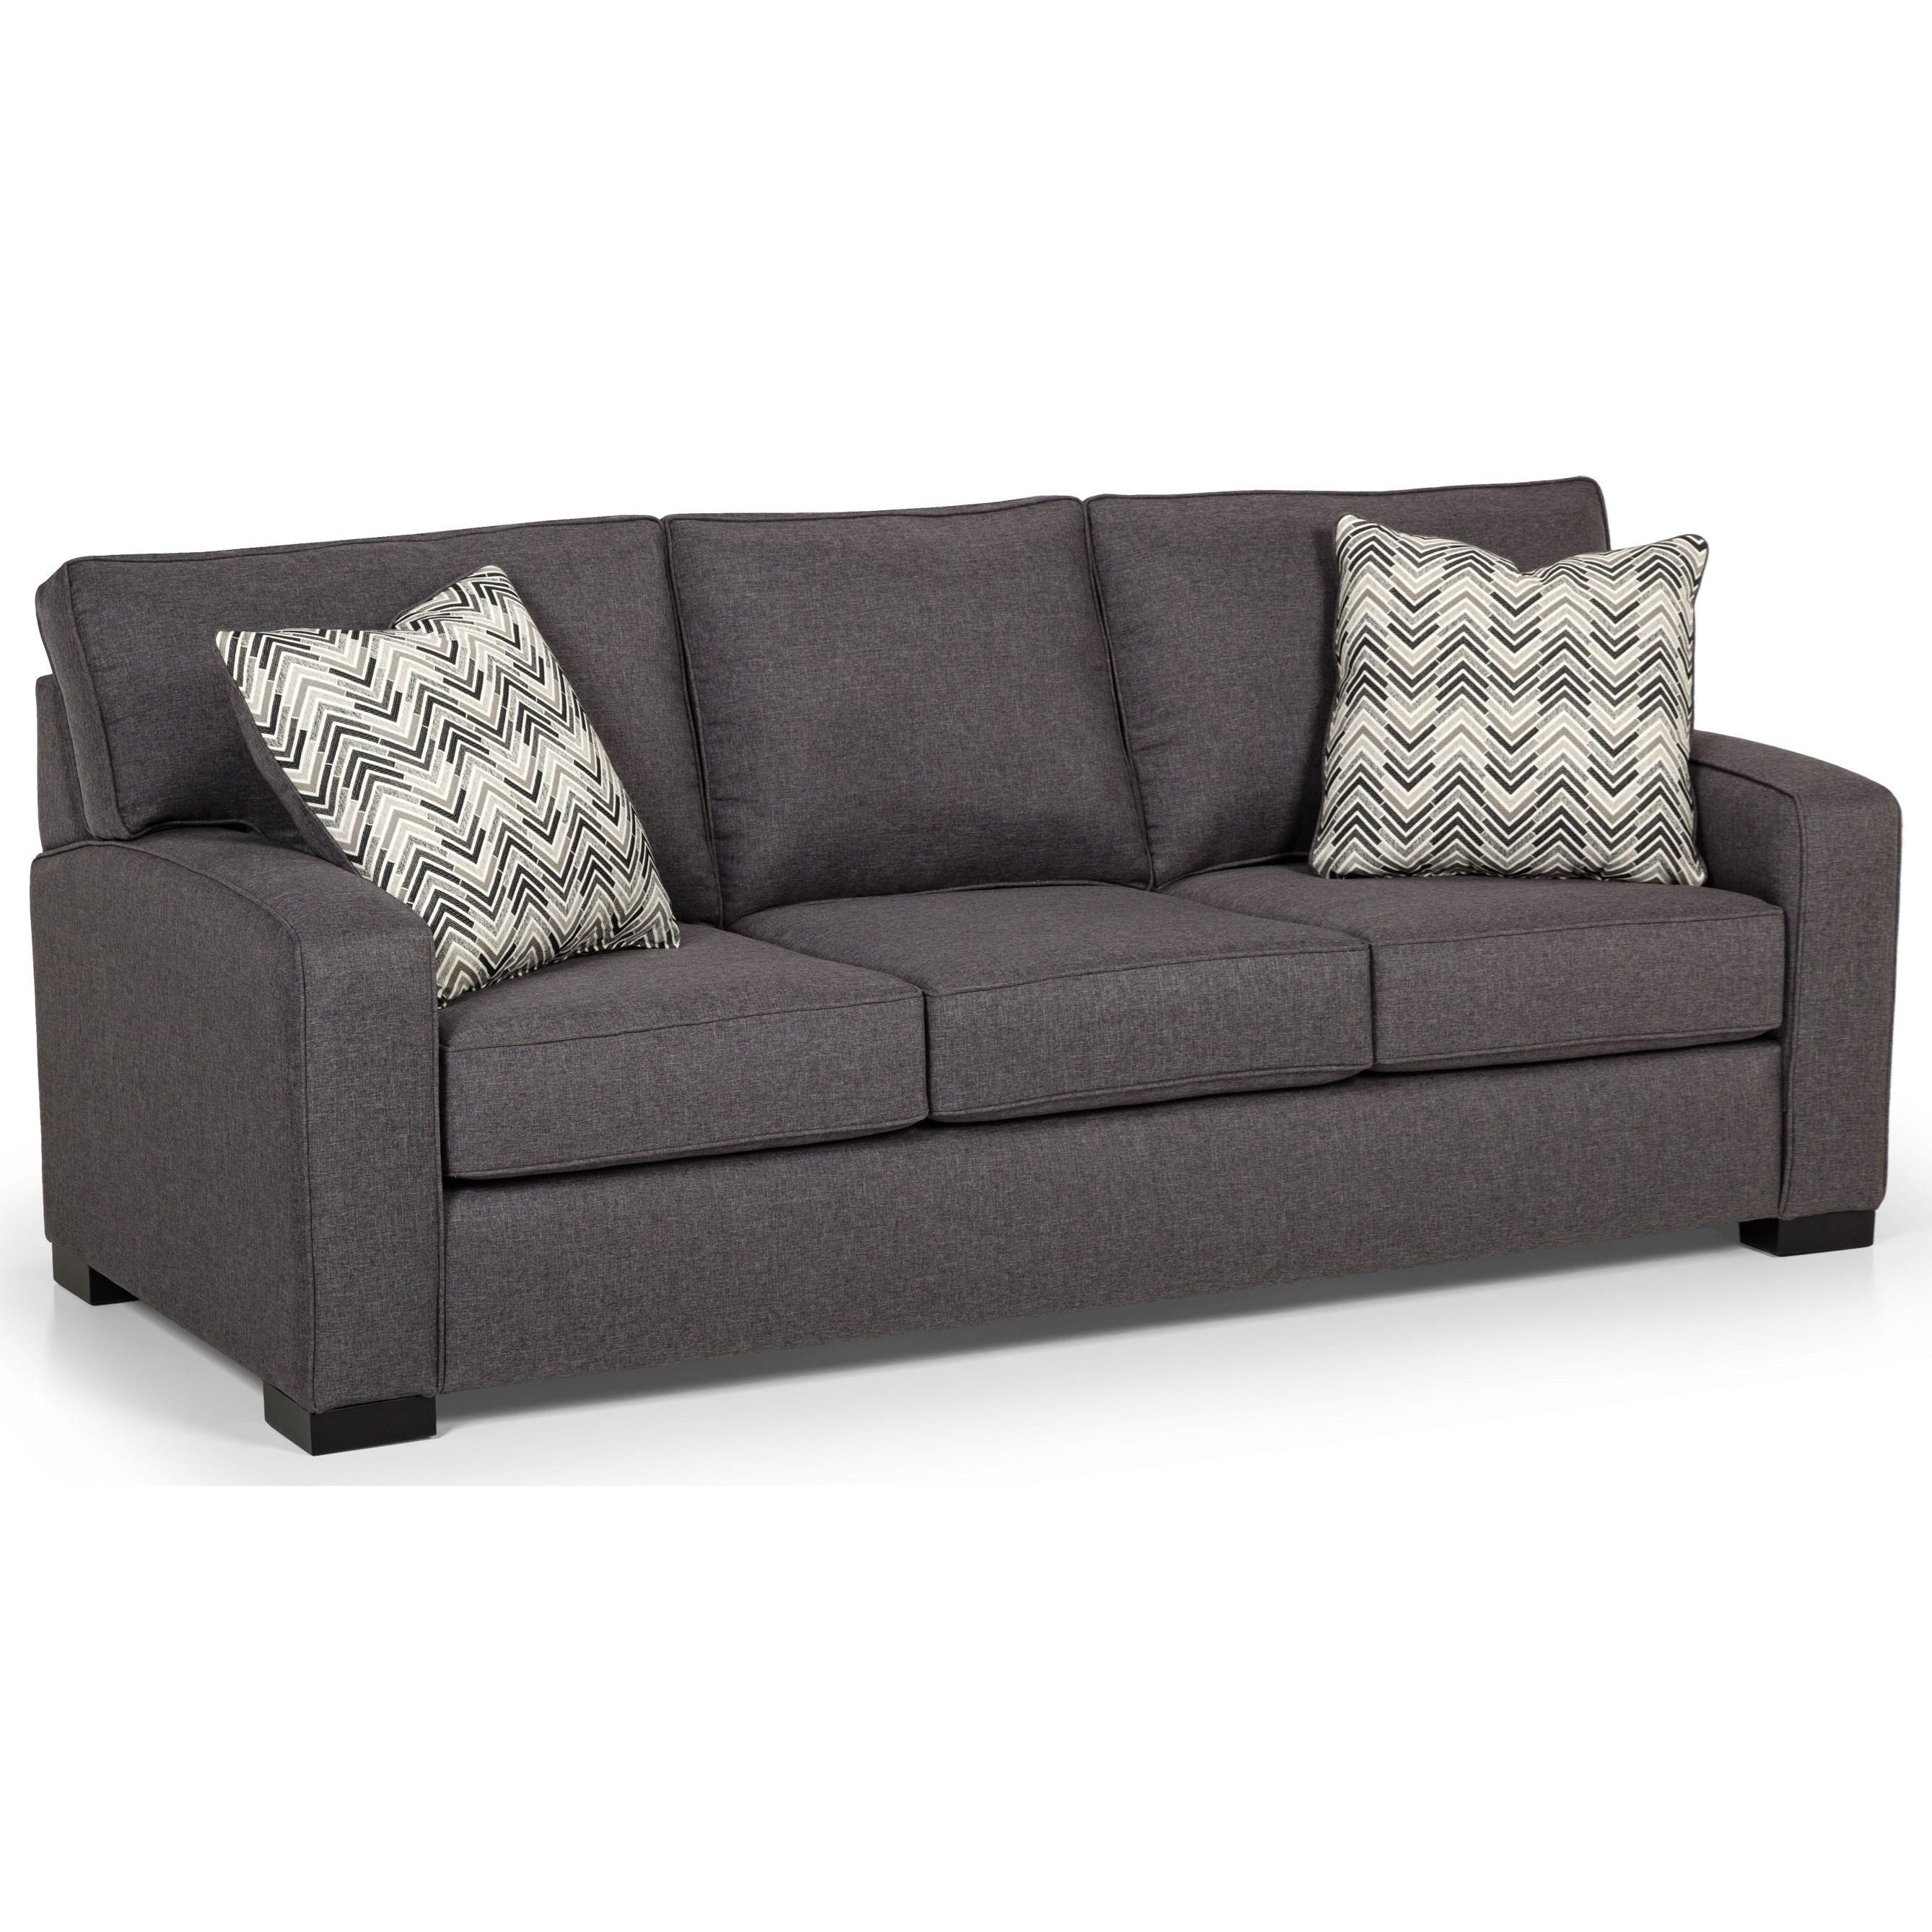 375 Queen Gel Sleeper Sofa by Stanton at Wilson's Furniture